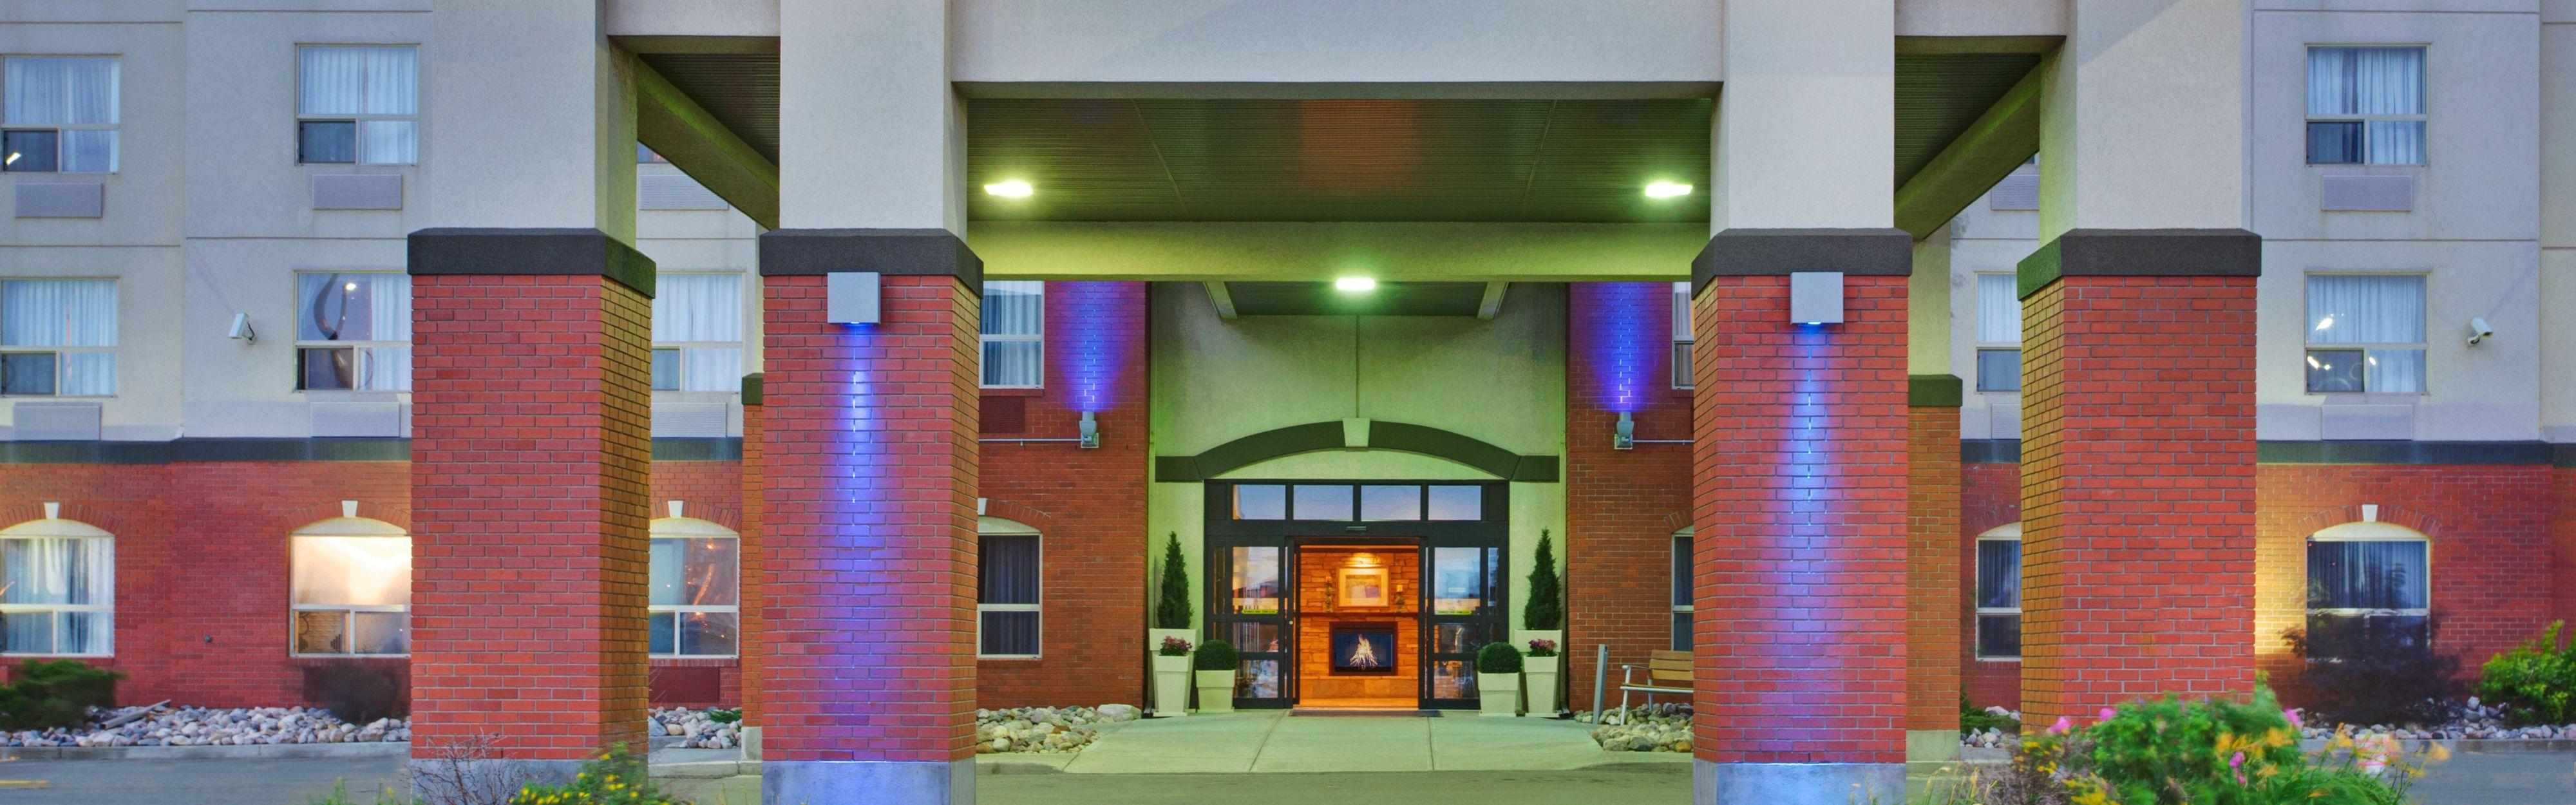 Holiday Inn Express & Suites Sherwood Park-Edmonton Area